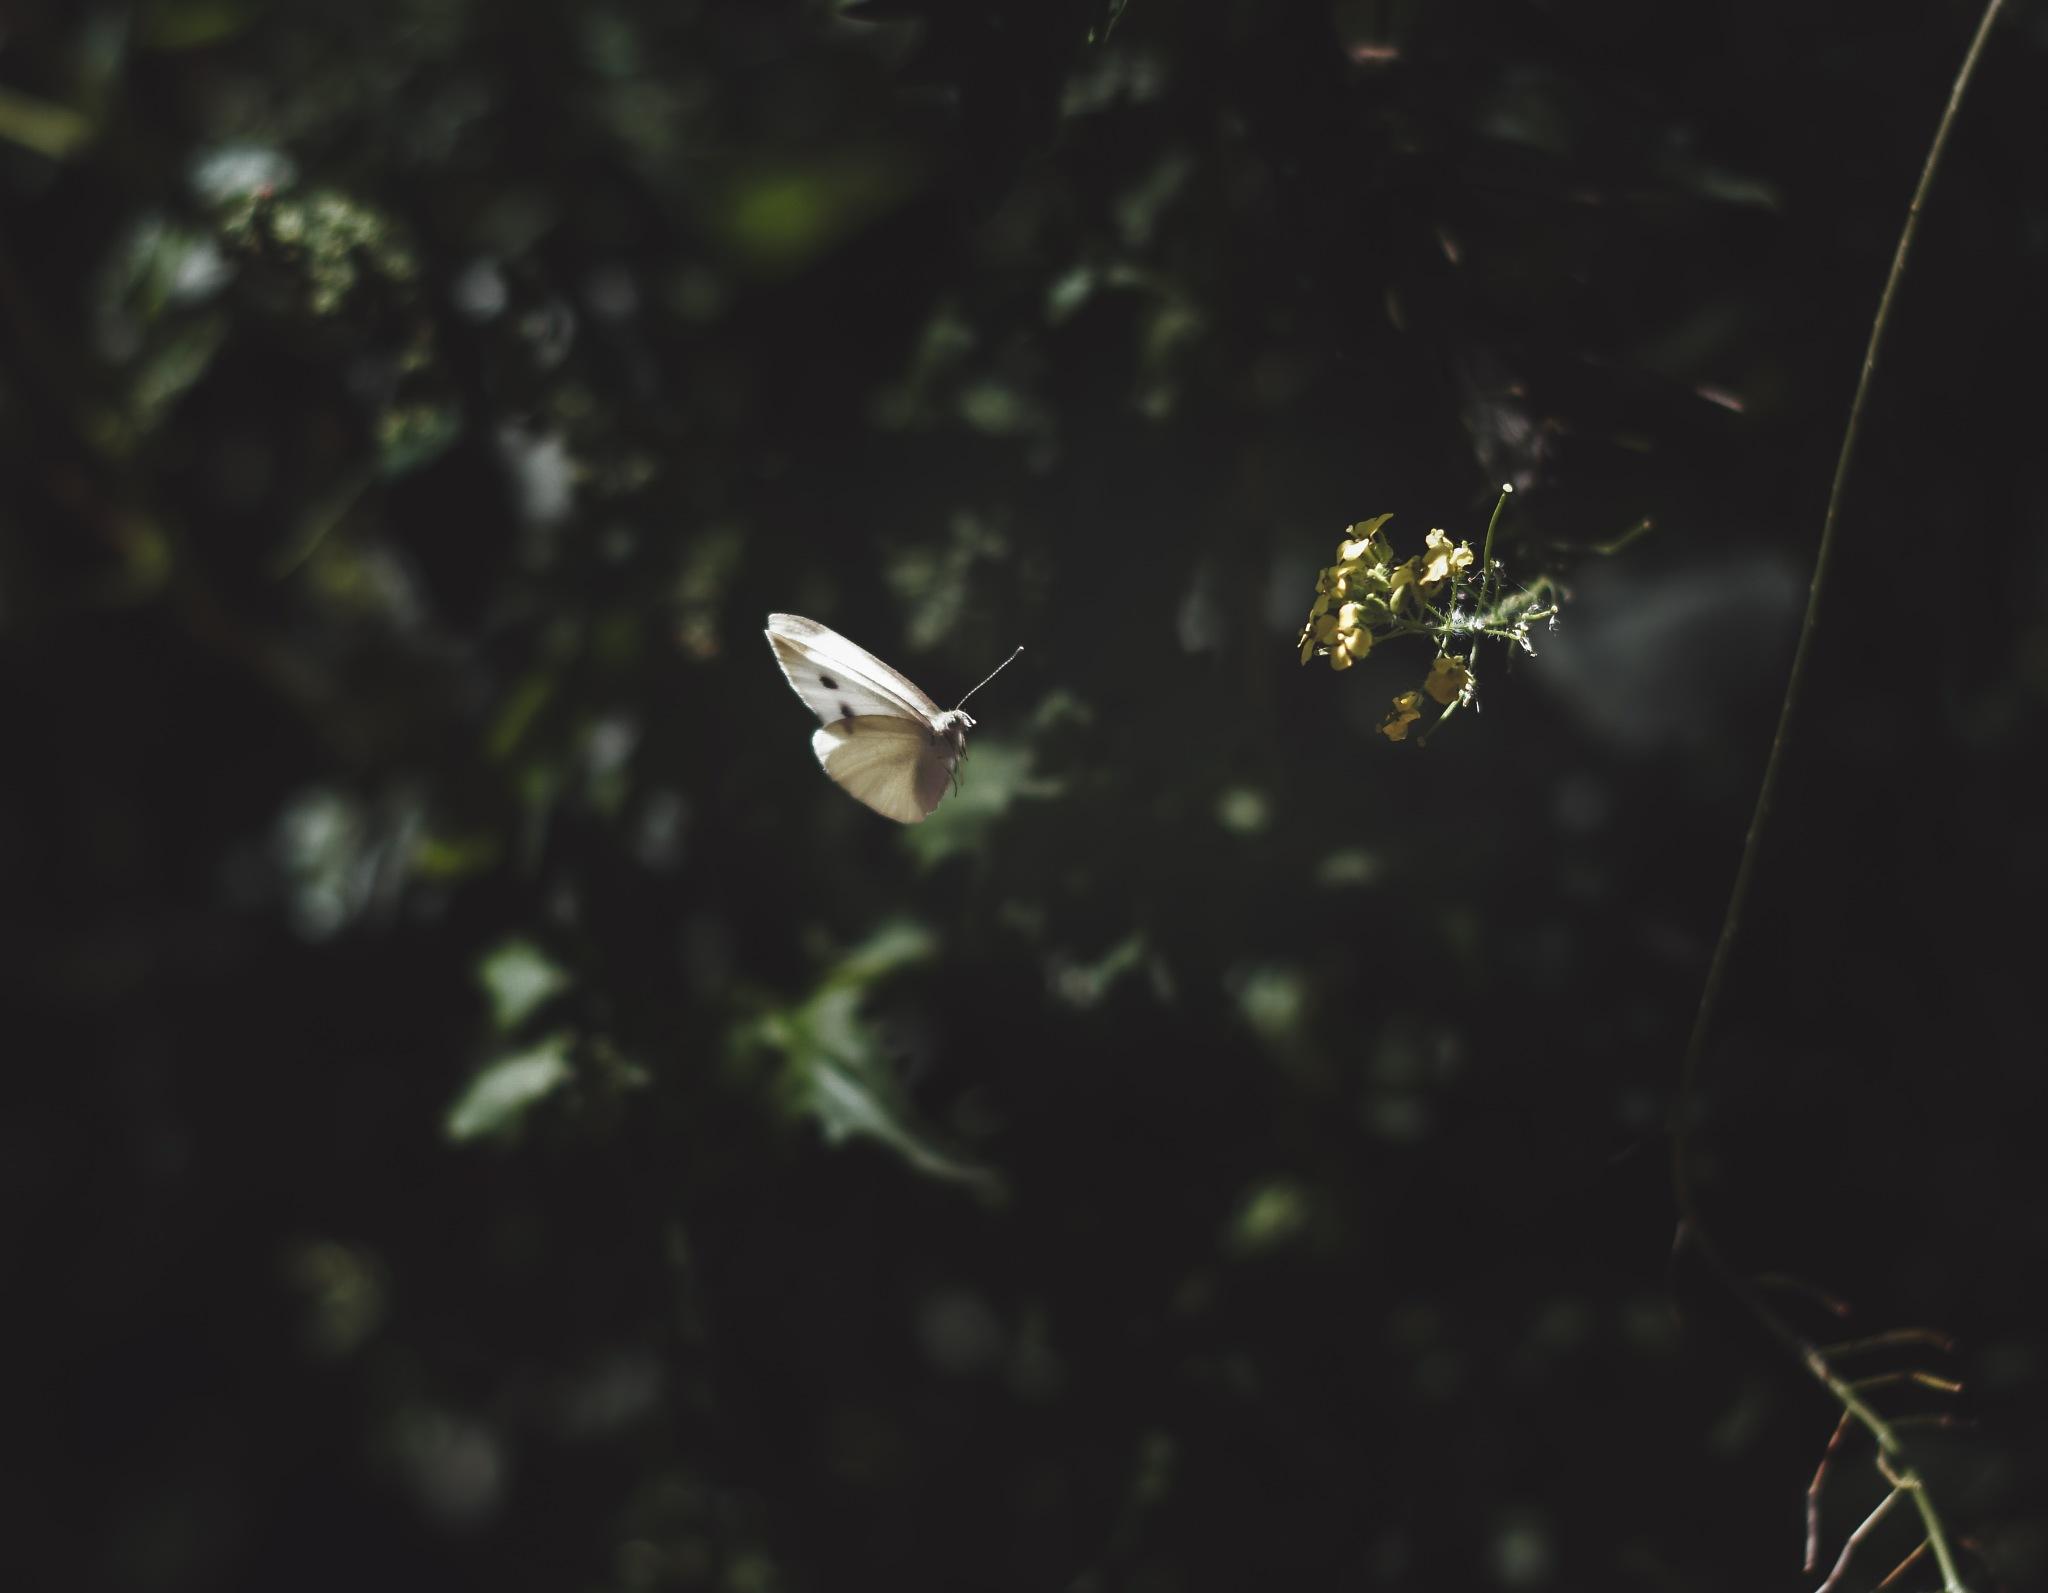 fly away by Jessica Holzmann